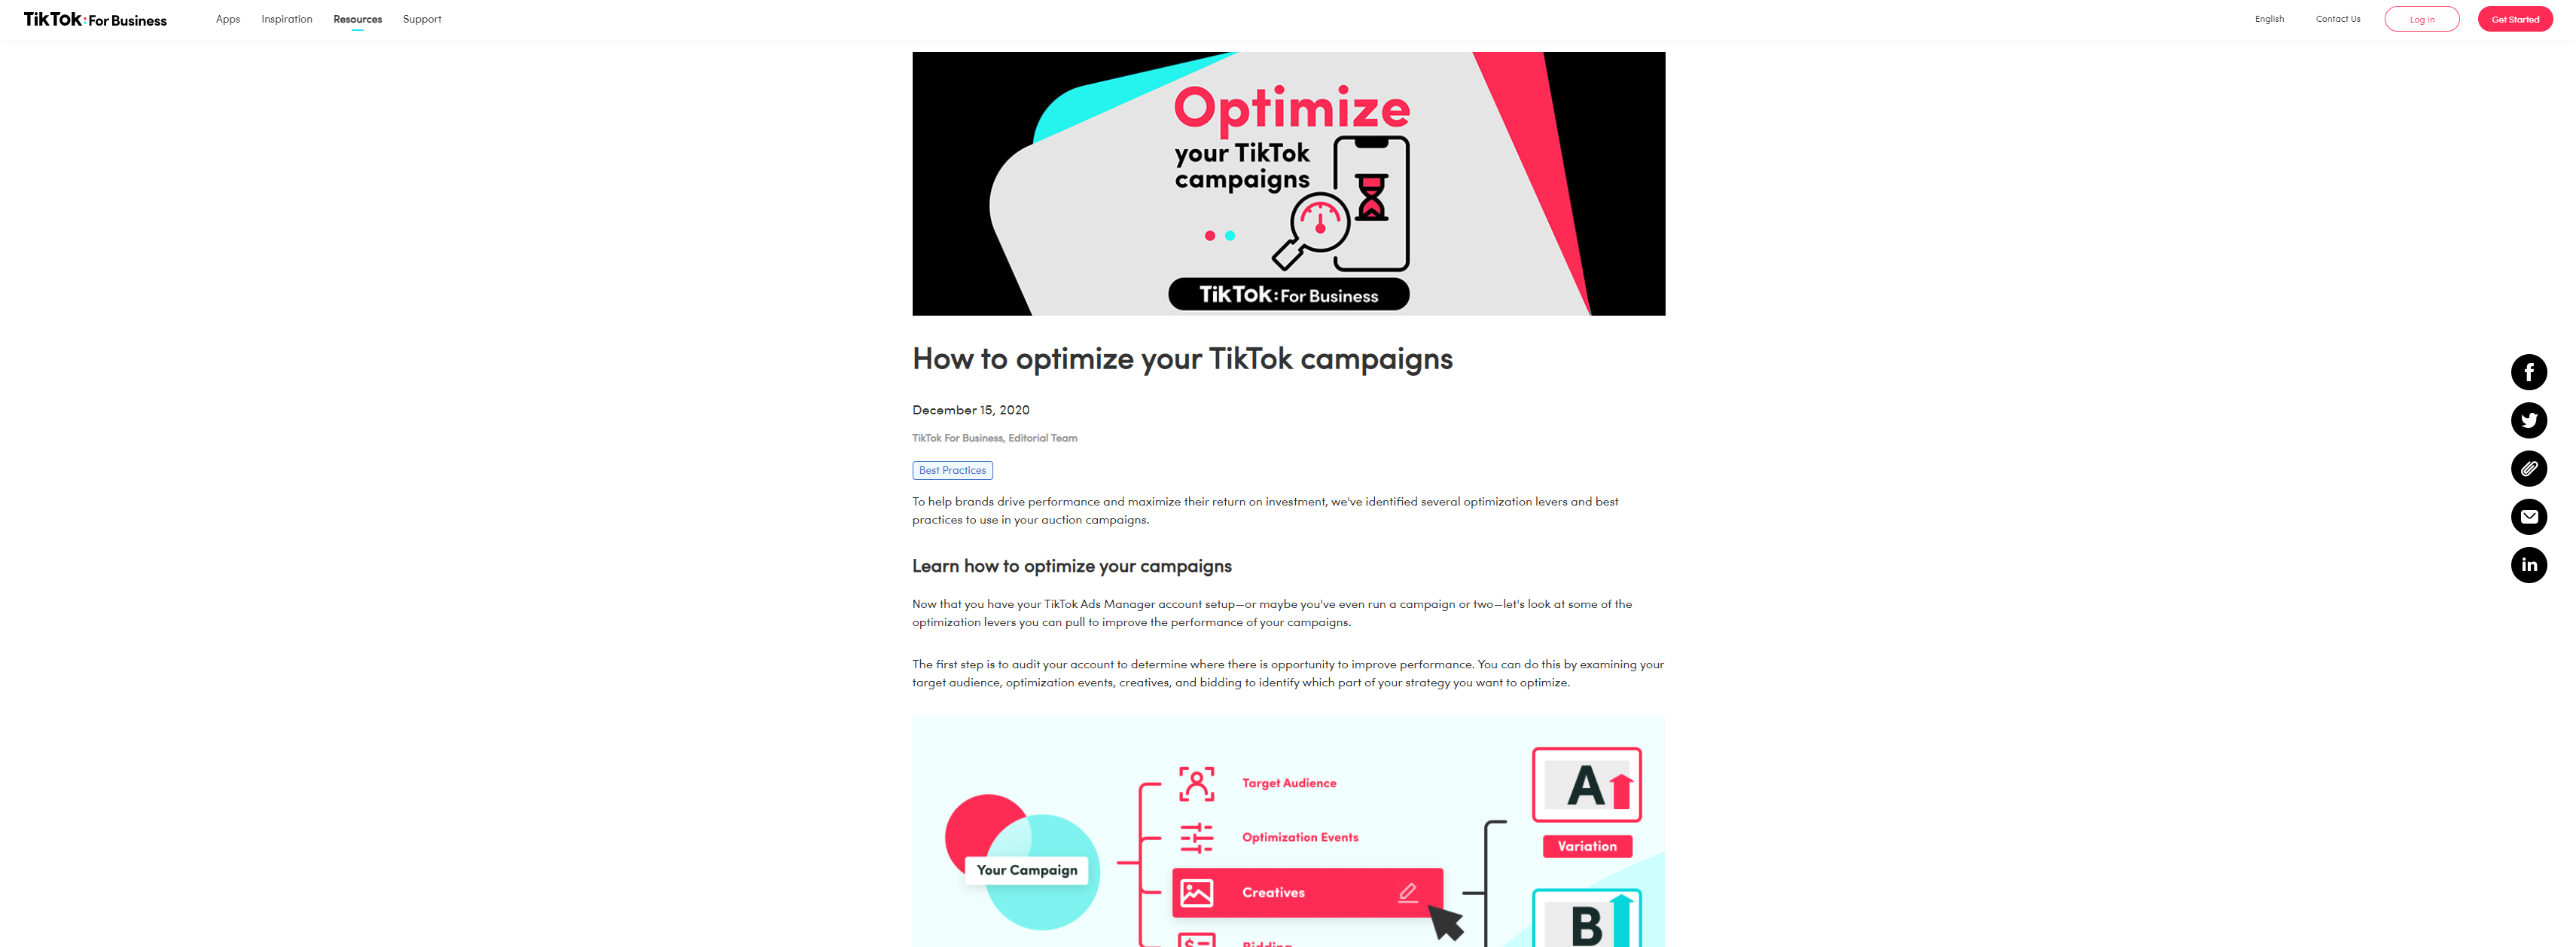 Advertise On TikTok Campaign AI Optimized Ads